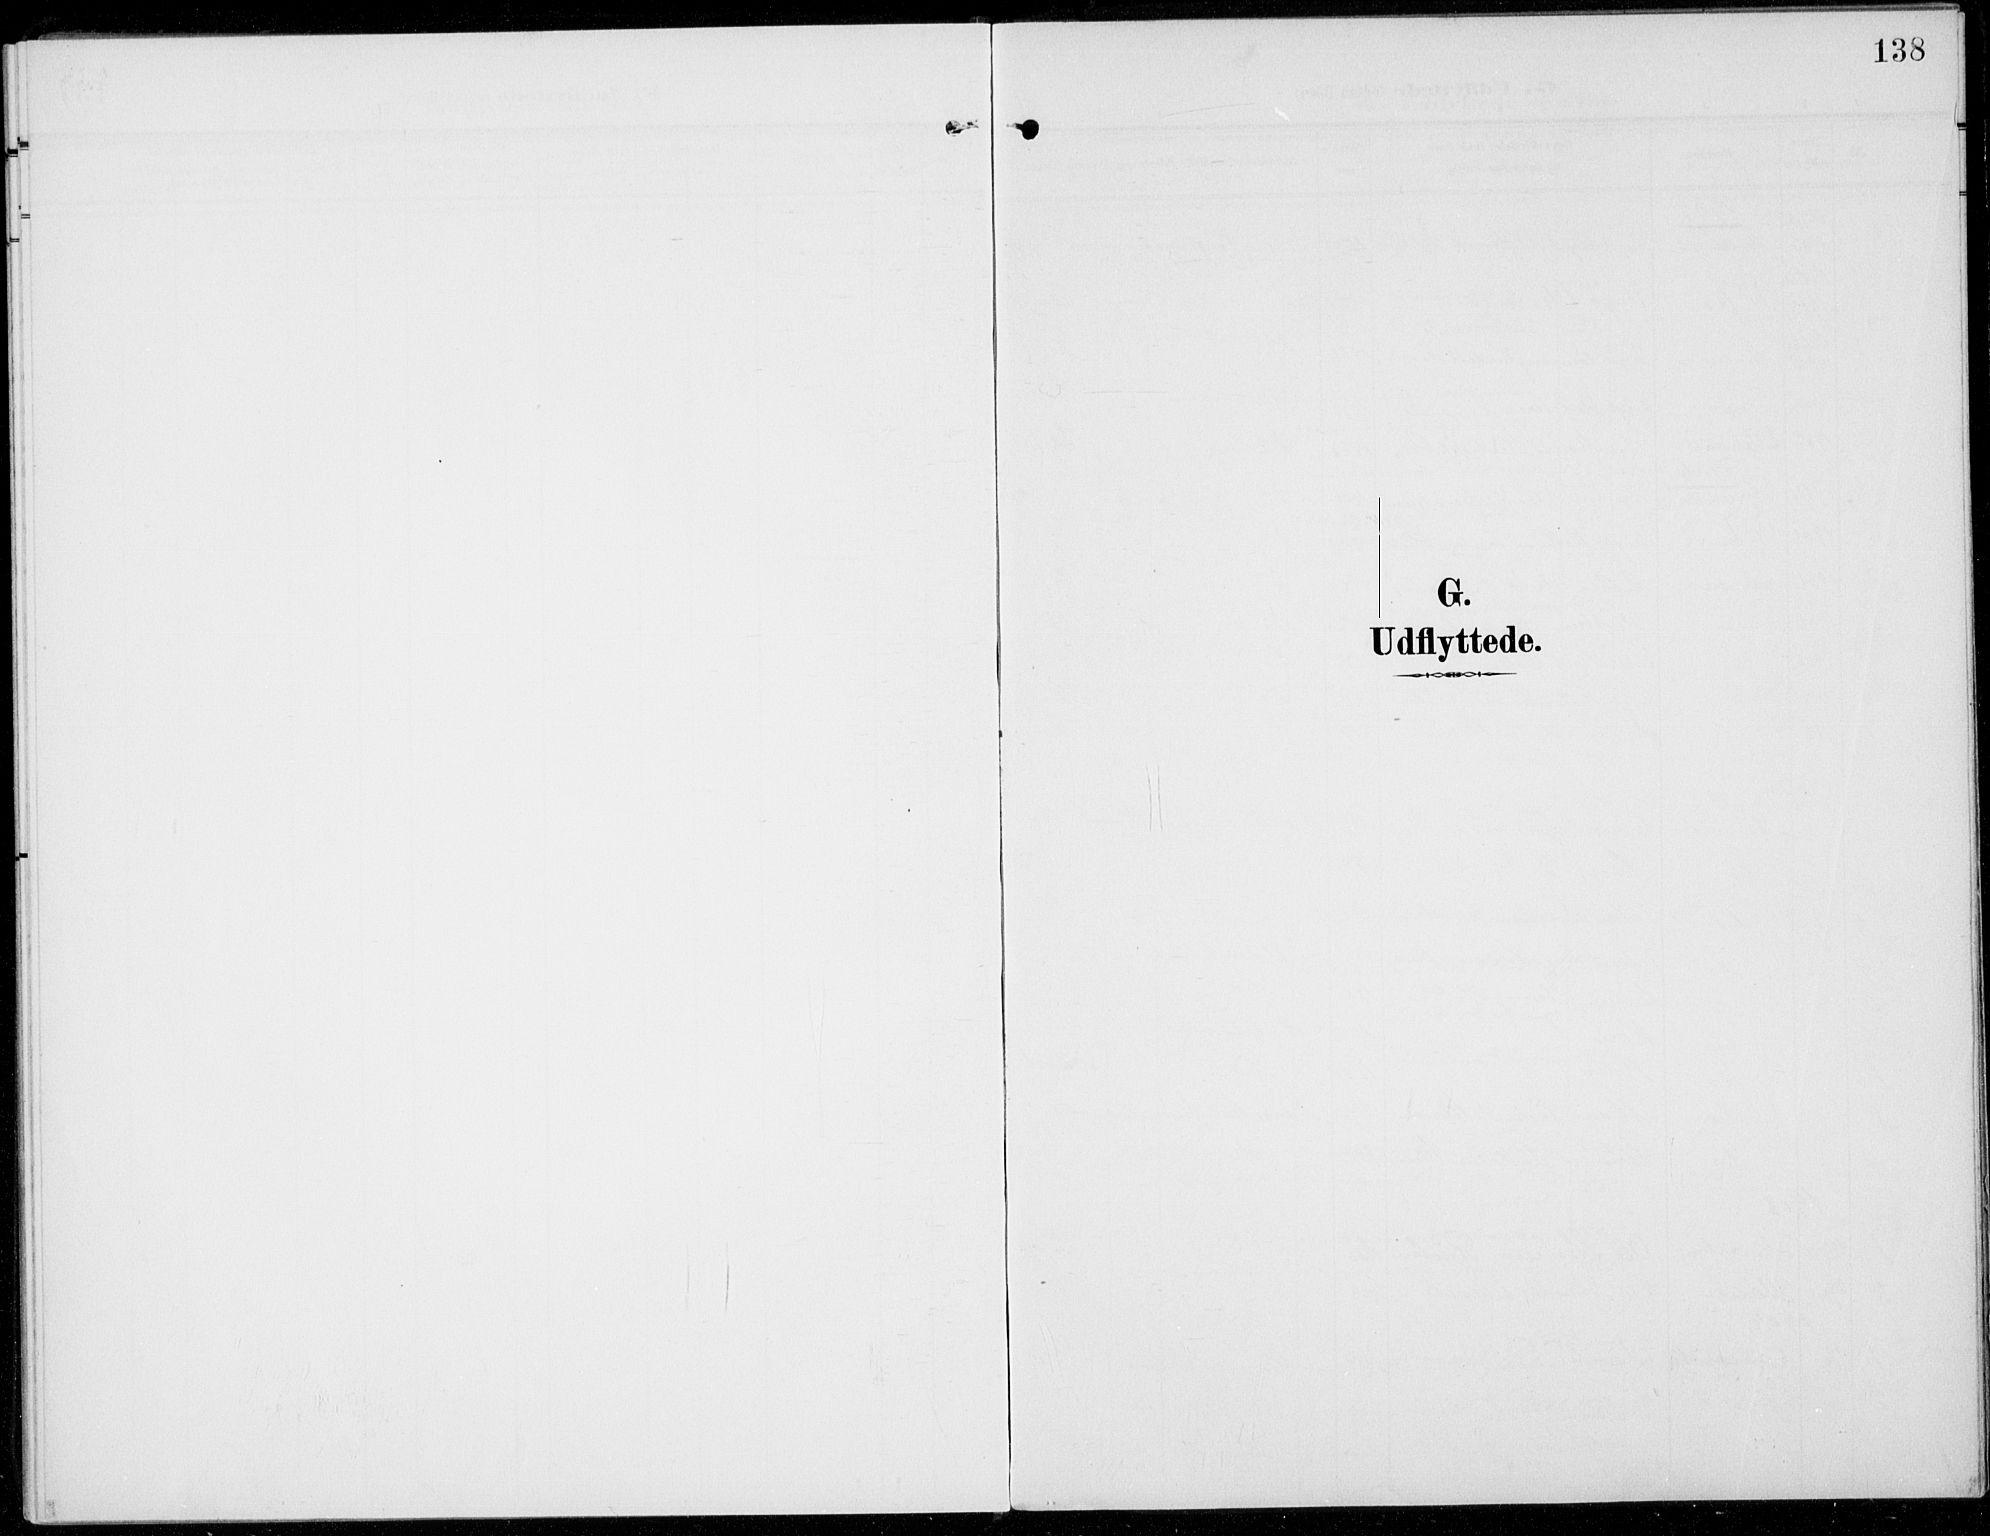 SAH, Sel prestekontor, Ministerialbok nr. 1, 1905-1922, s. 138